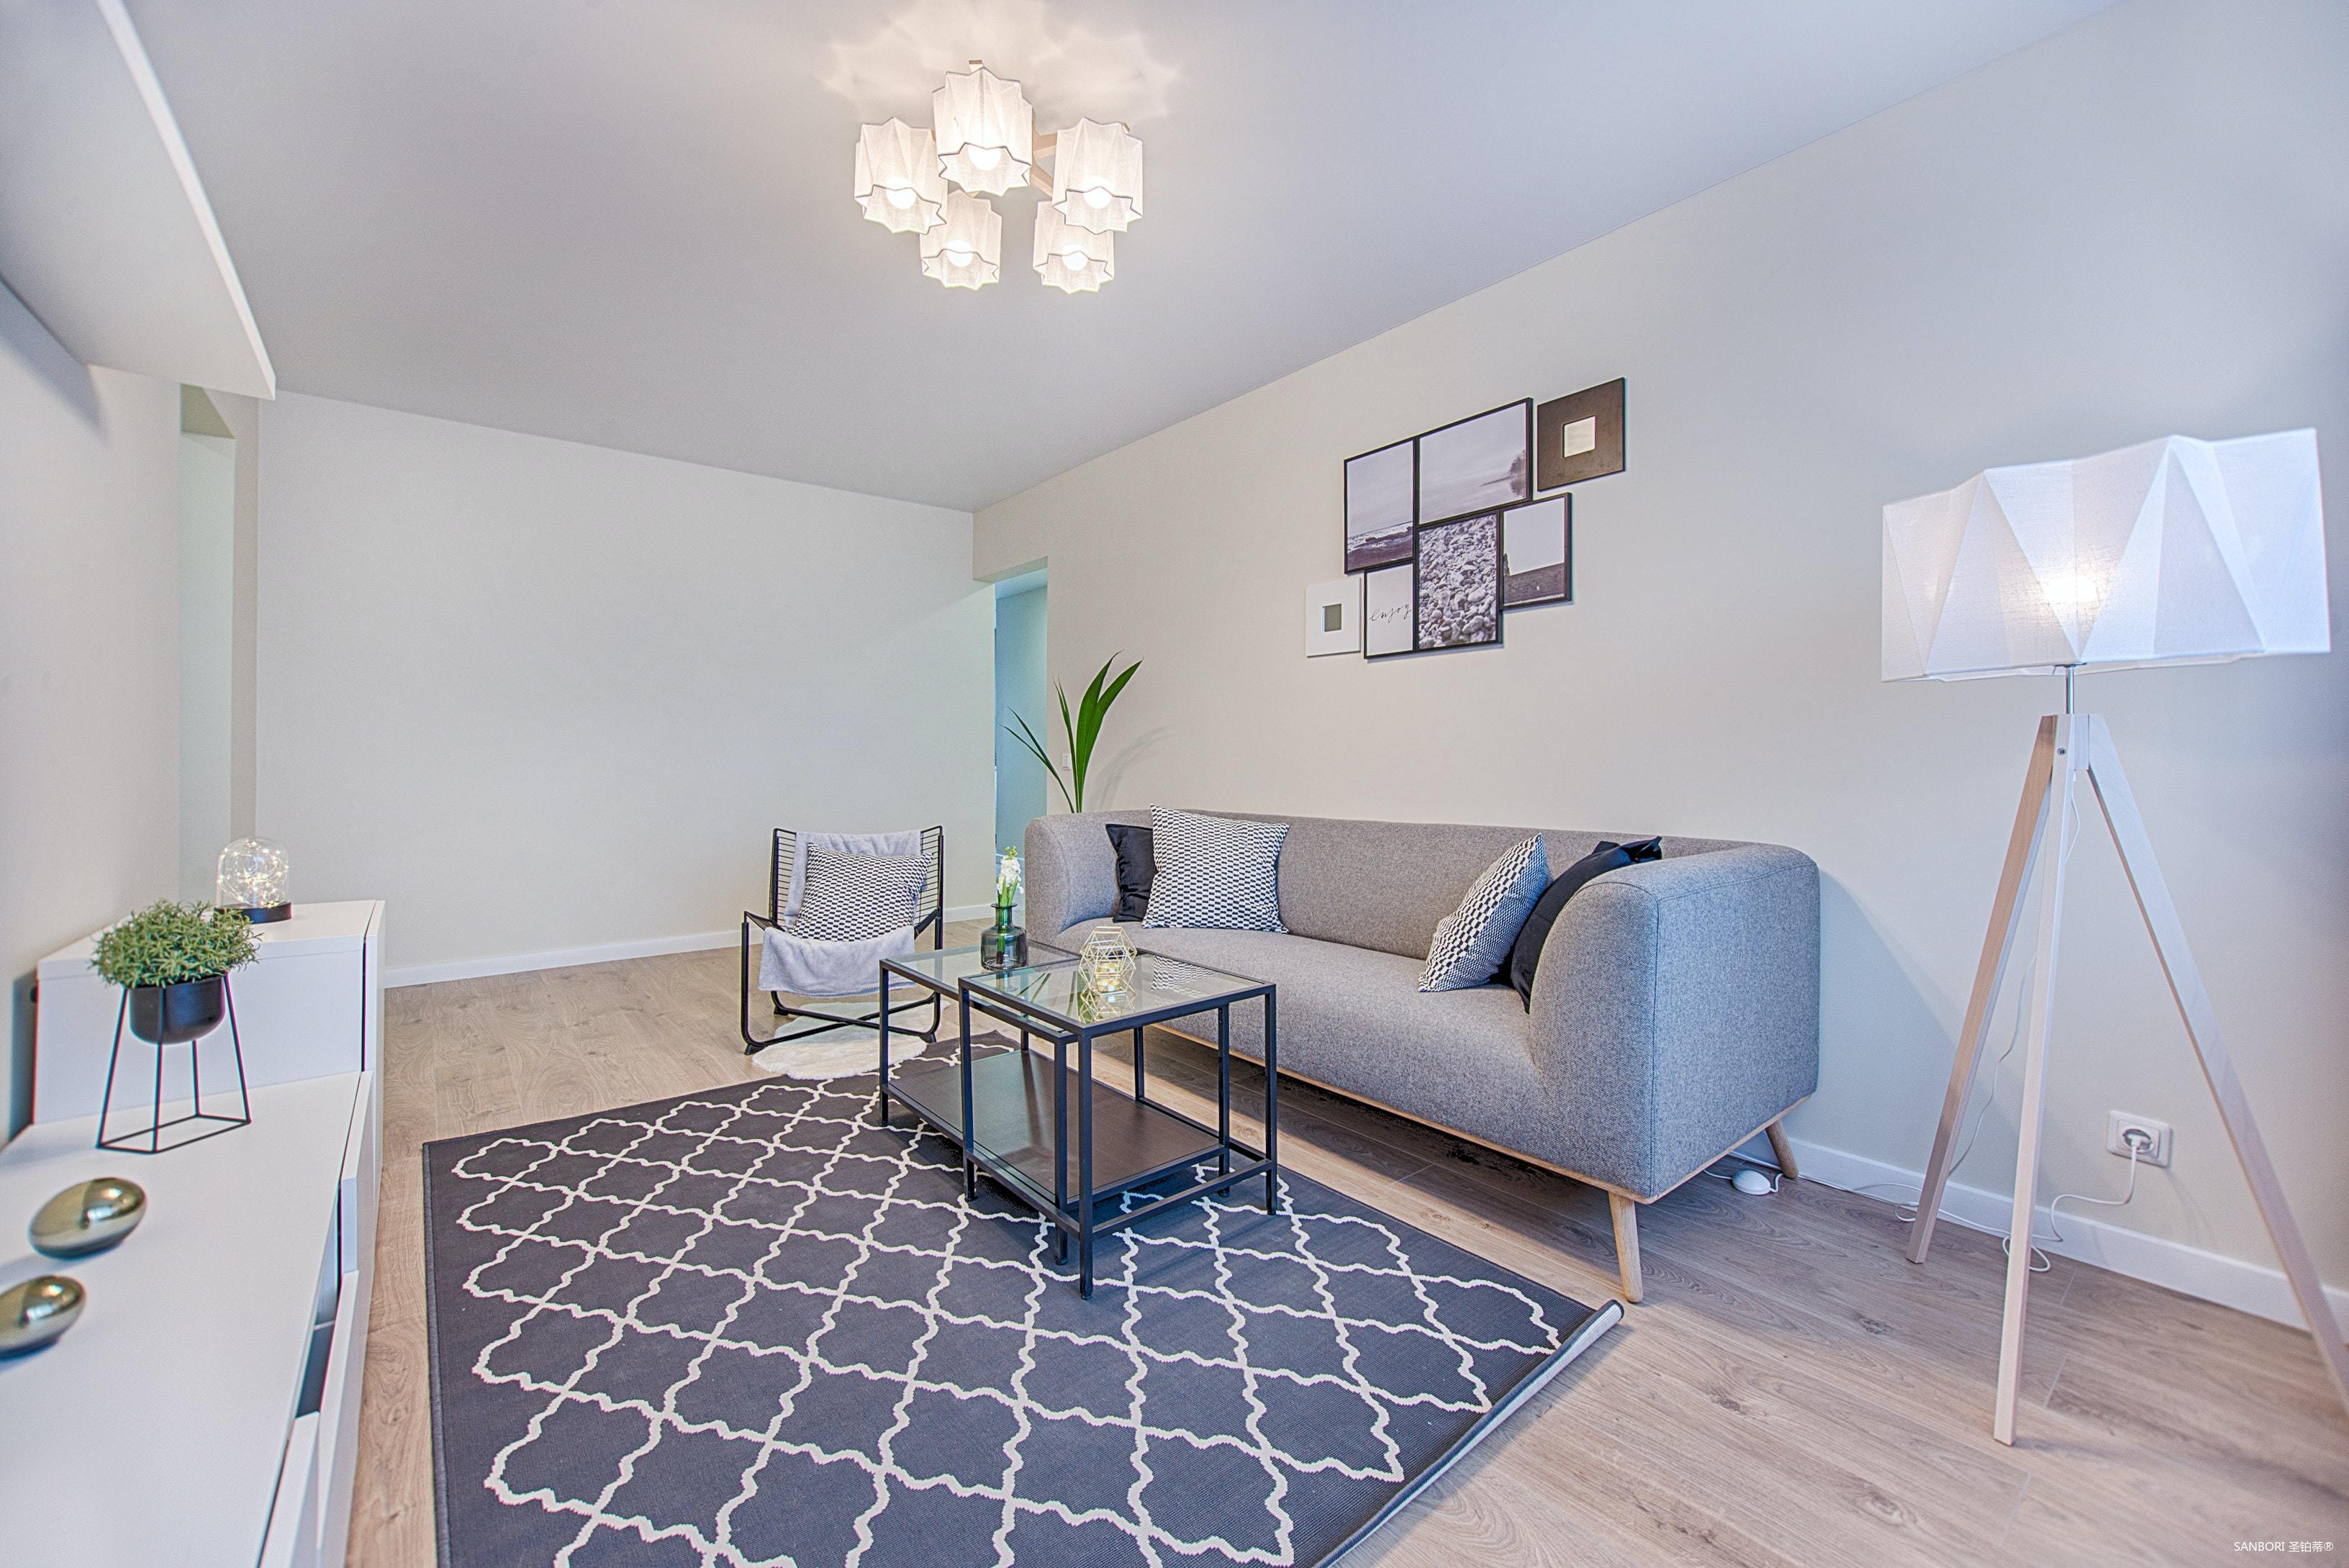 gray-fabric-sofa-placed-indoor-1571468.jpg